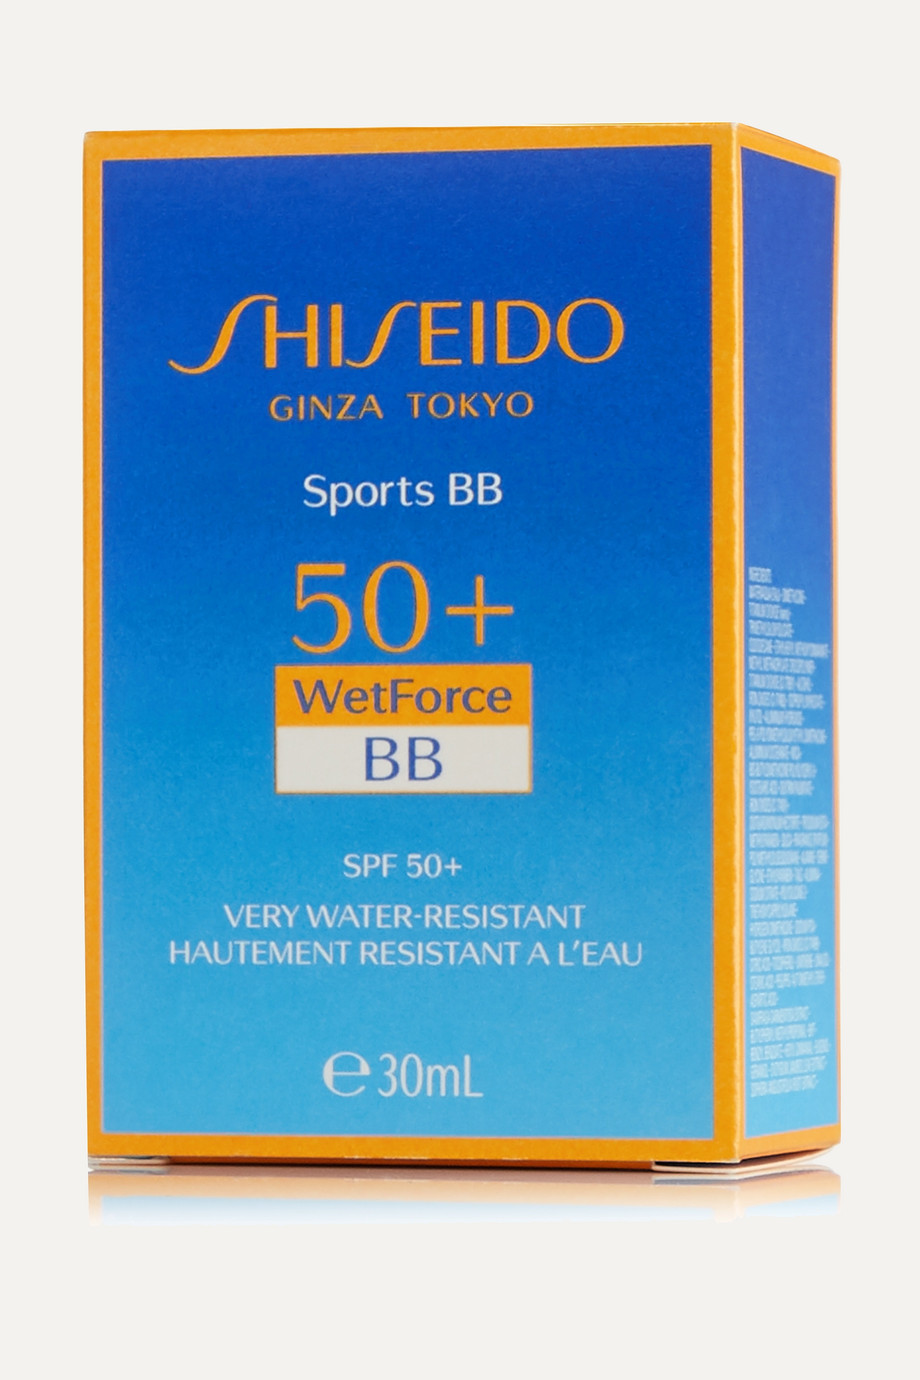 Shiseido Sports BB WetForce LSF 50+ – Light, 30 ml – Getönte Sonnencreme